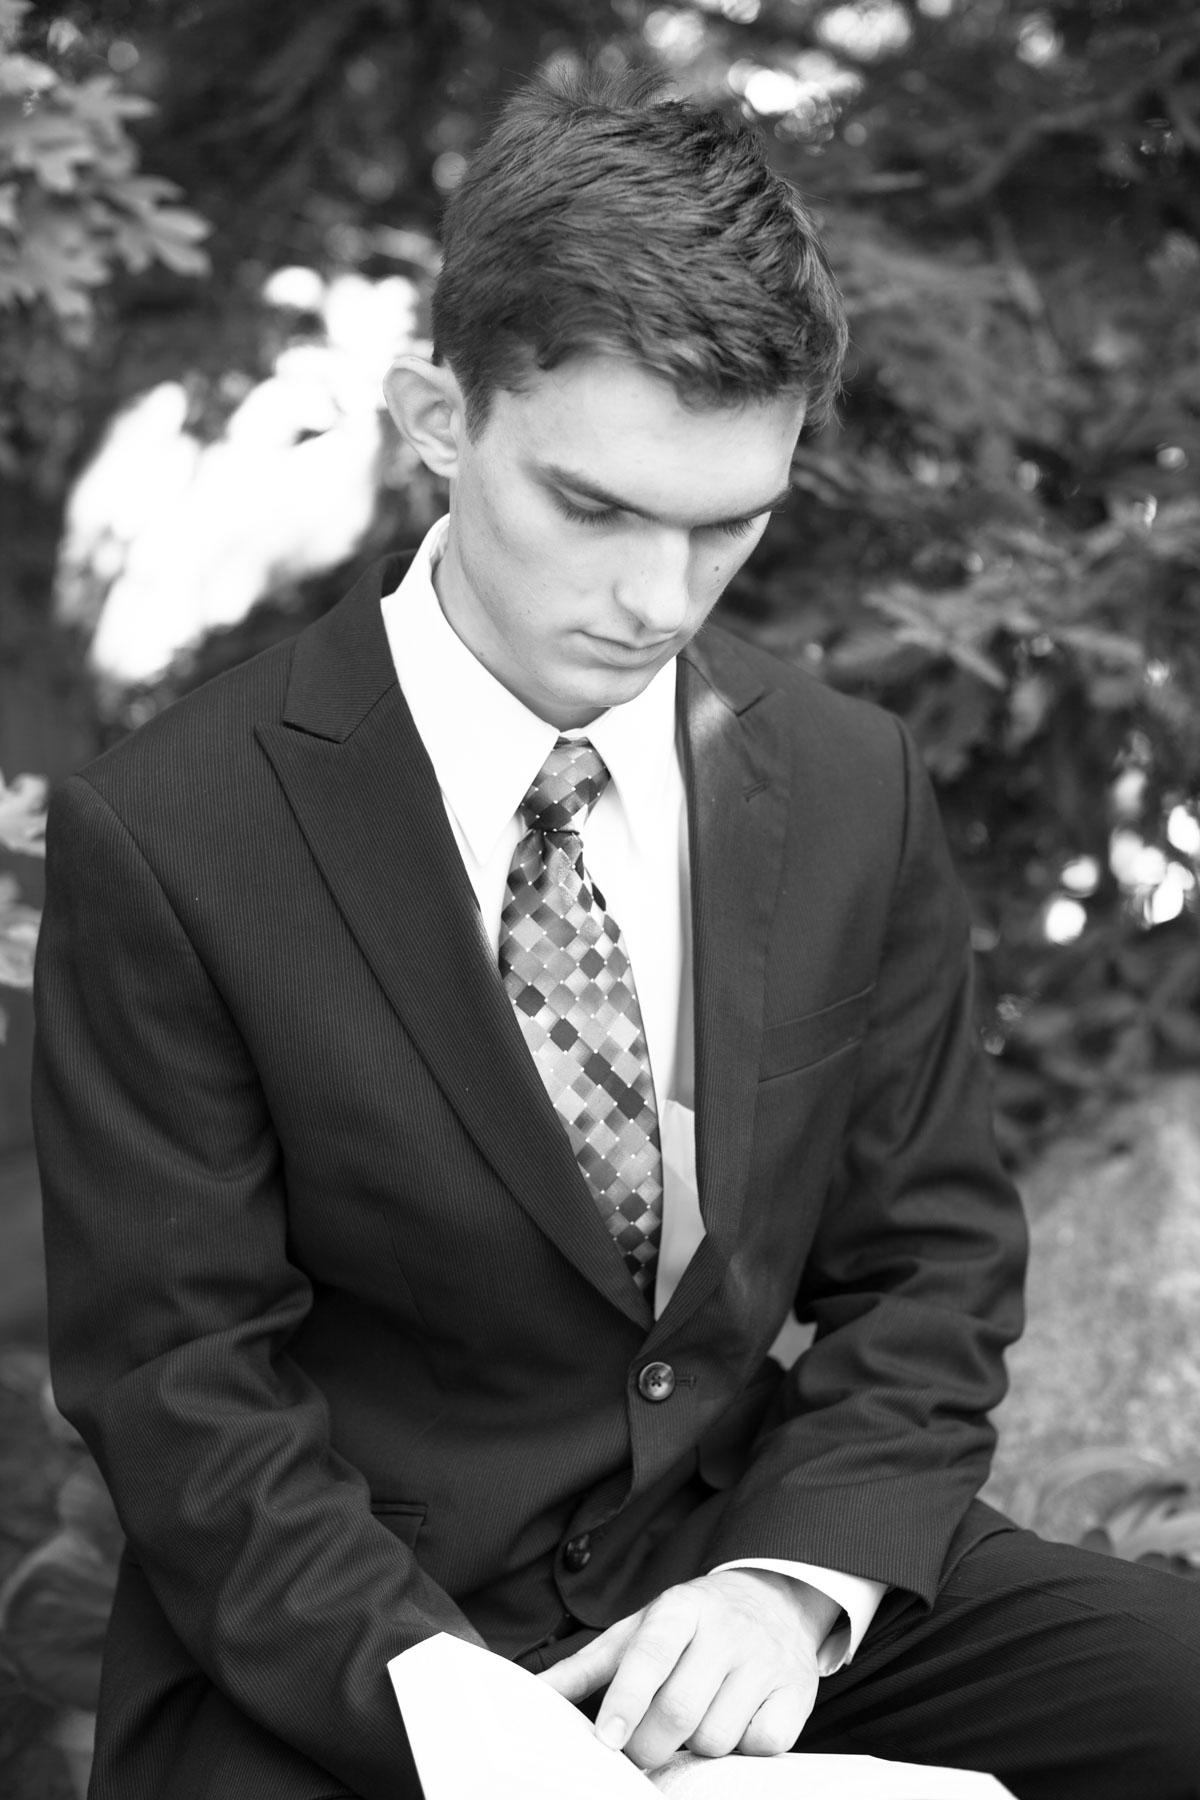 Missionary Portrait Photography #vezzaniphotography